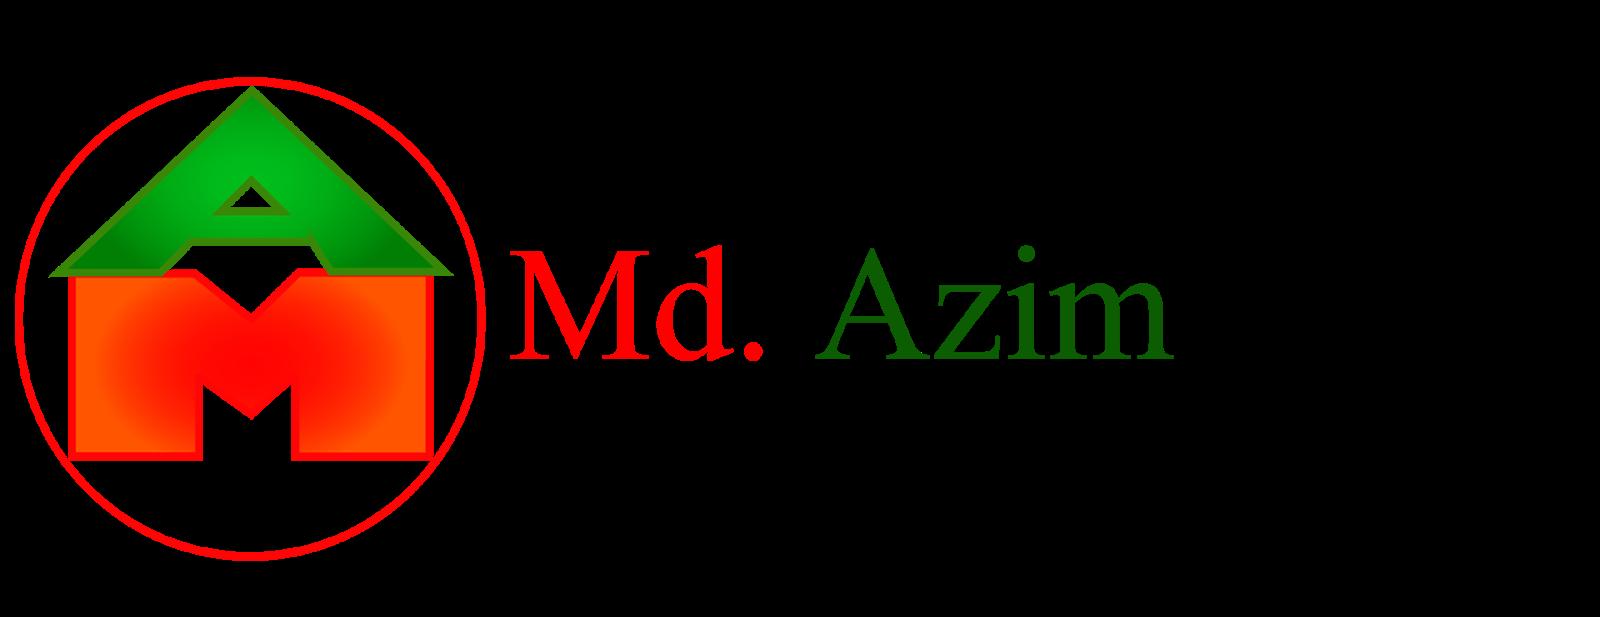 Md Azim's Vlog